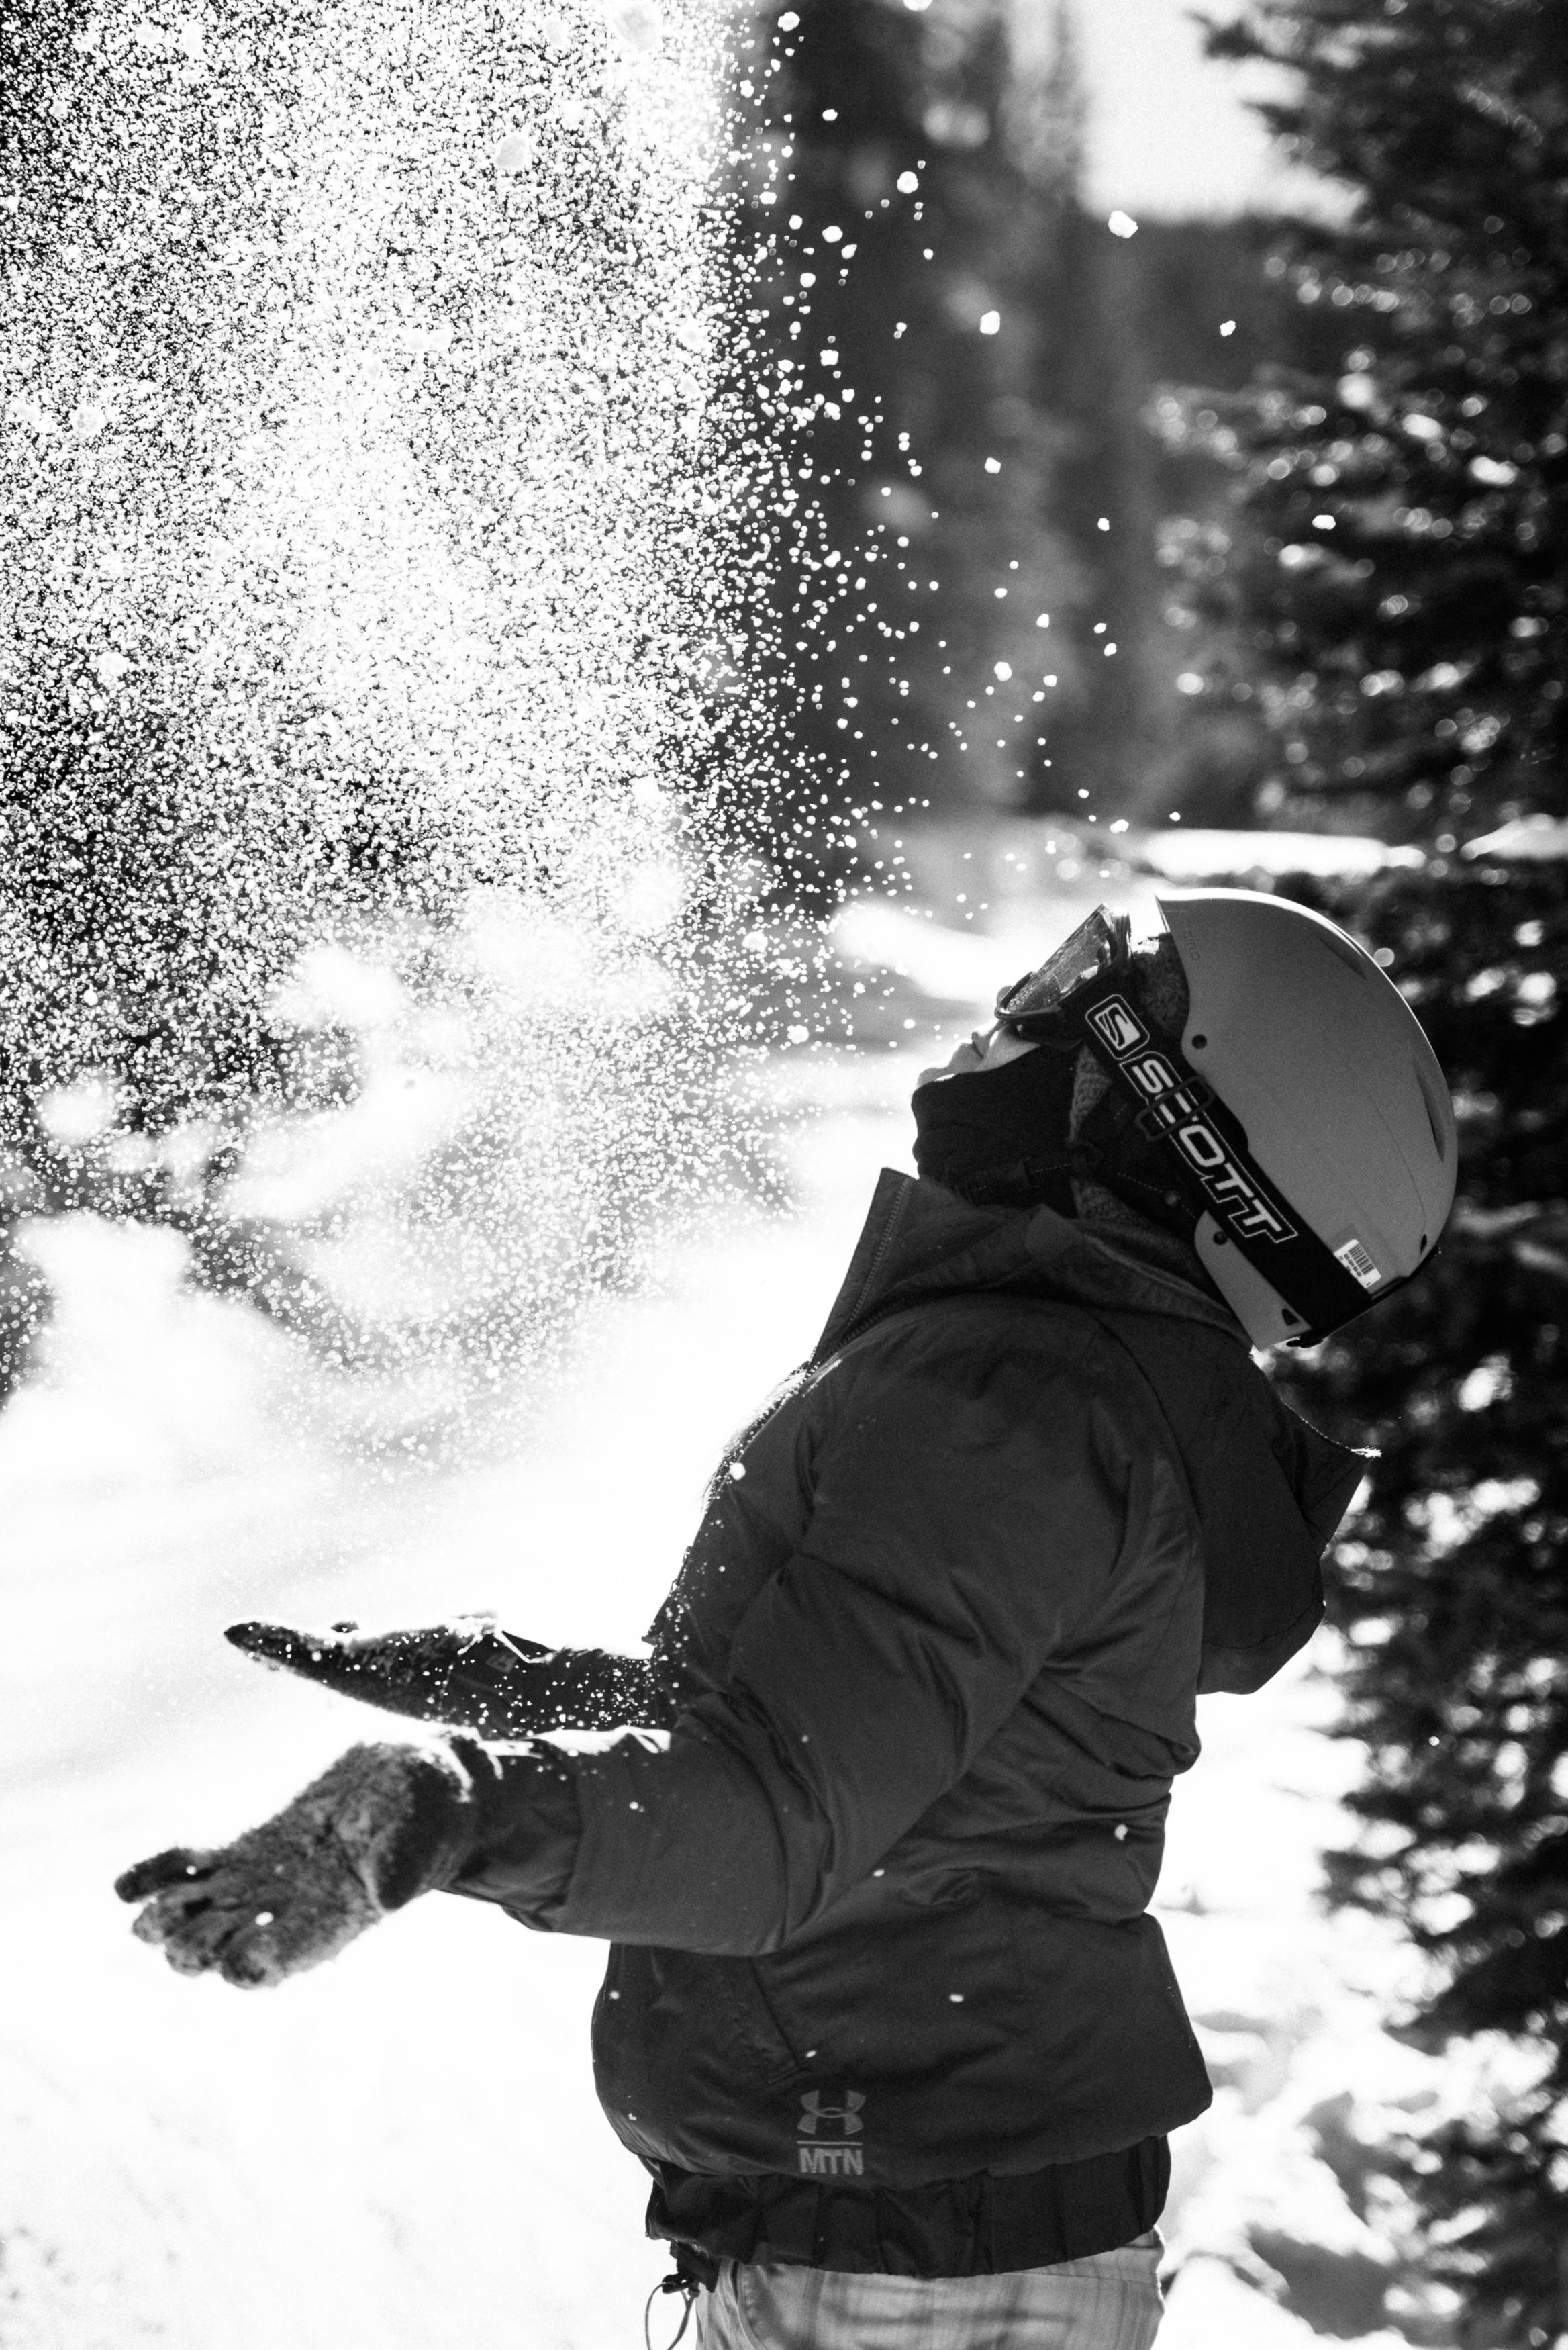 TaraShupe_Outdoor_Photographer_Loweprobags_Colorado_Copper_Mountains_Ski_39.jpg